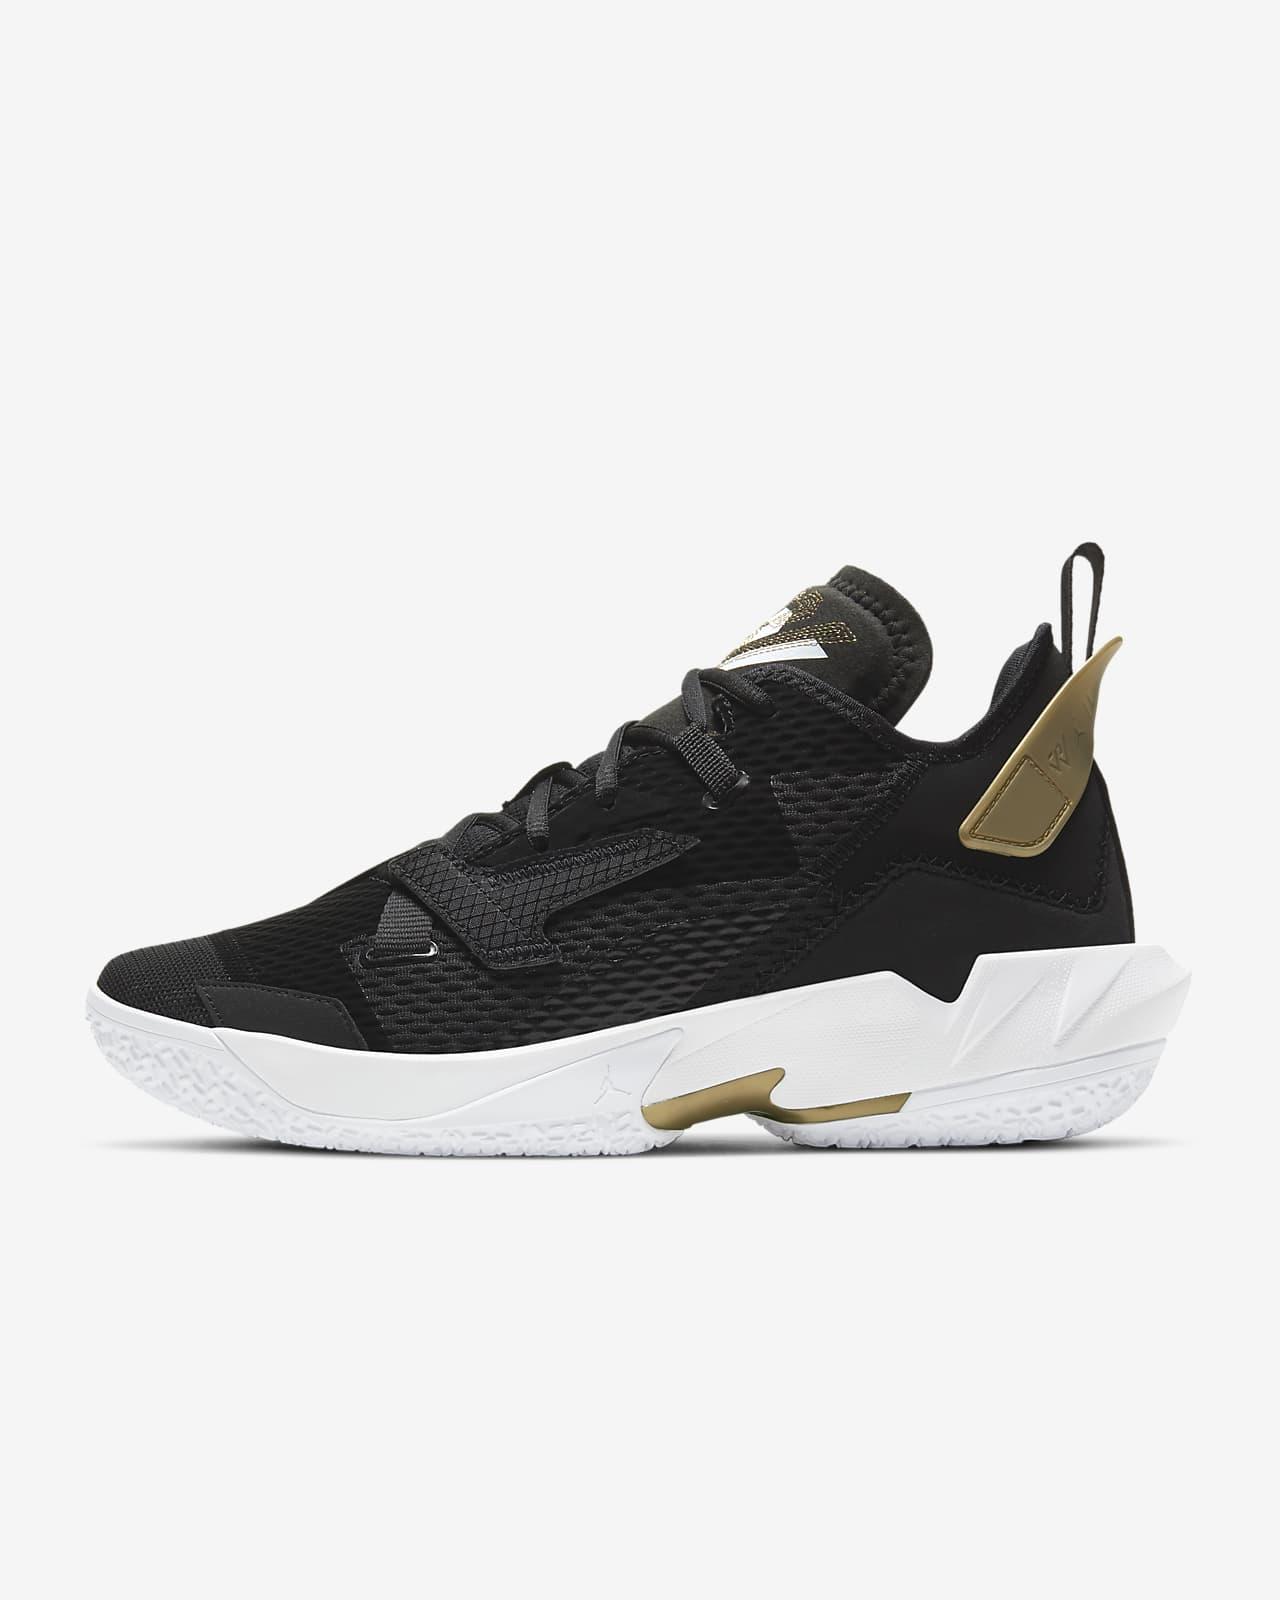 "Jordan Why Not? Zer0.4 ""Family"" PF Basketball Shoe"